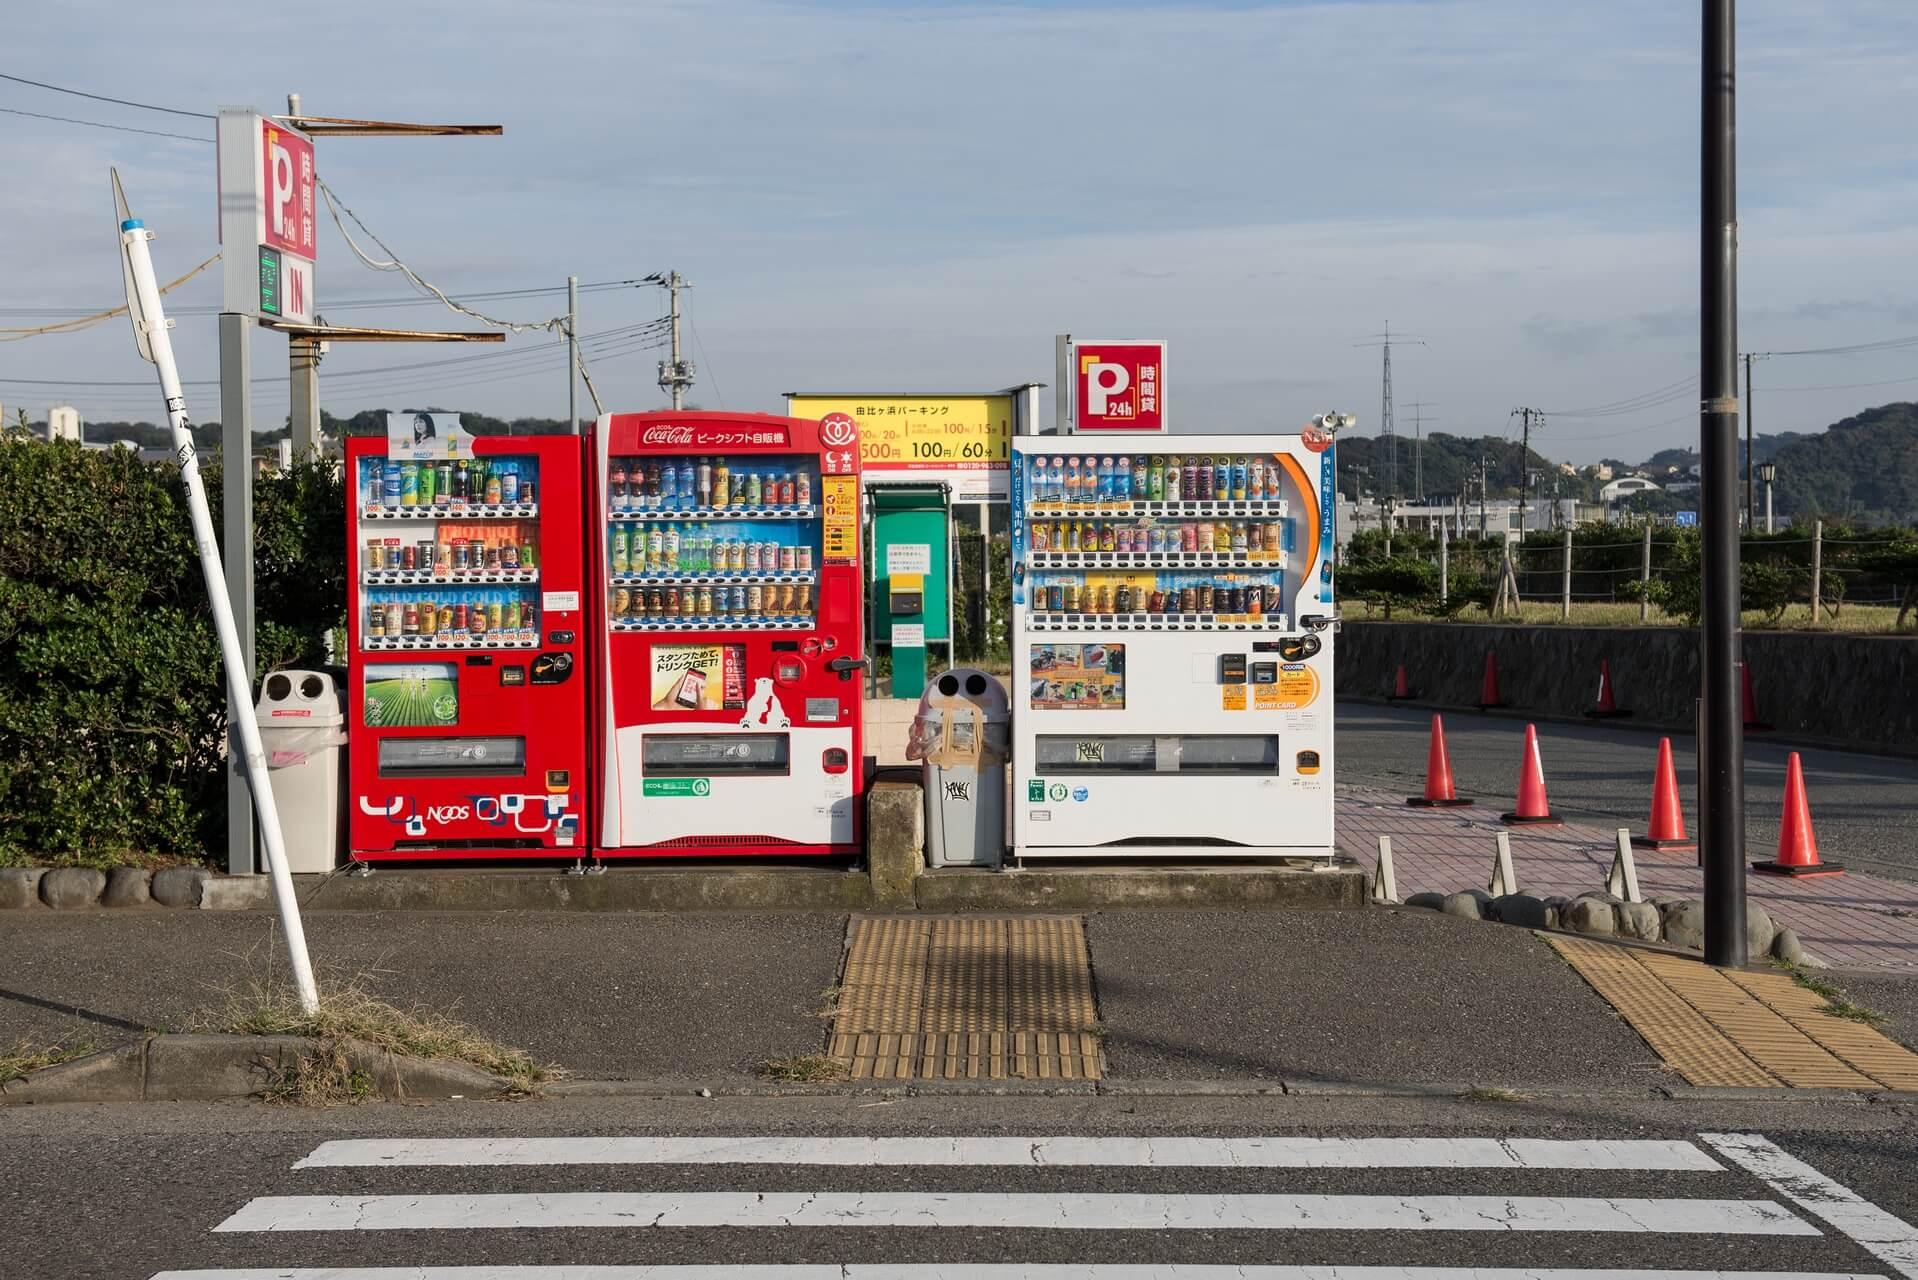 Japan Vending Machines, Fotograf: Steffen Lohse